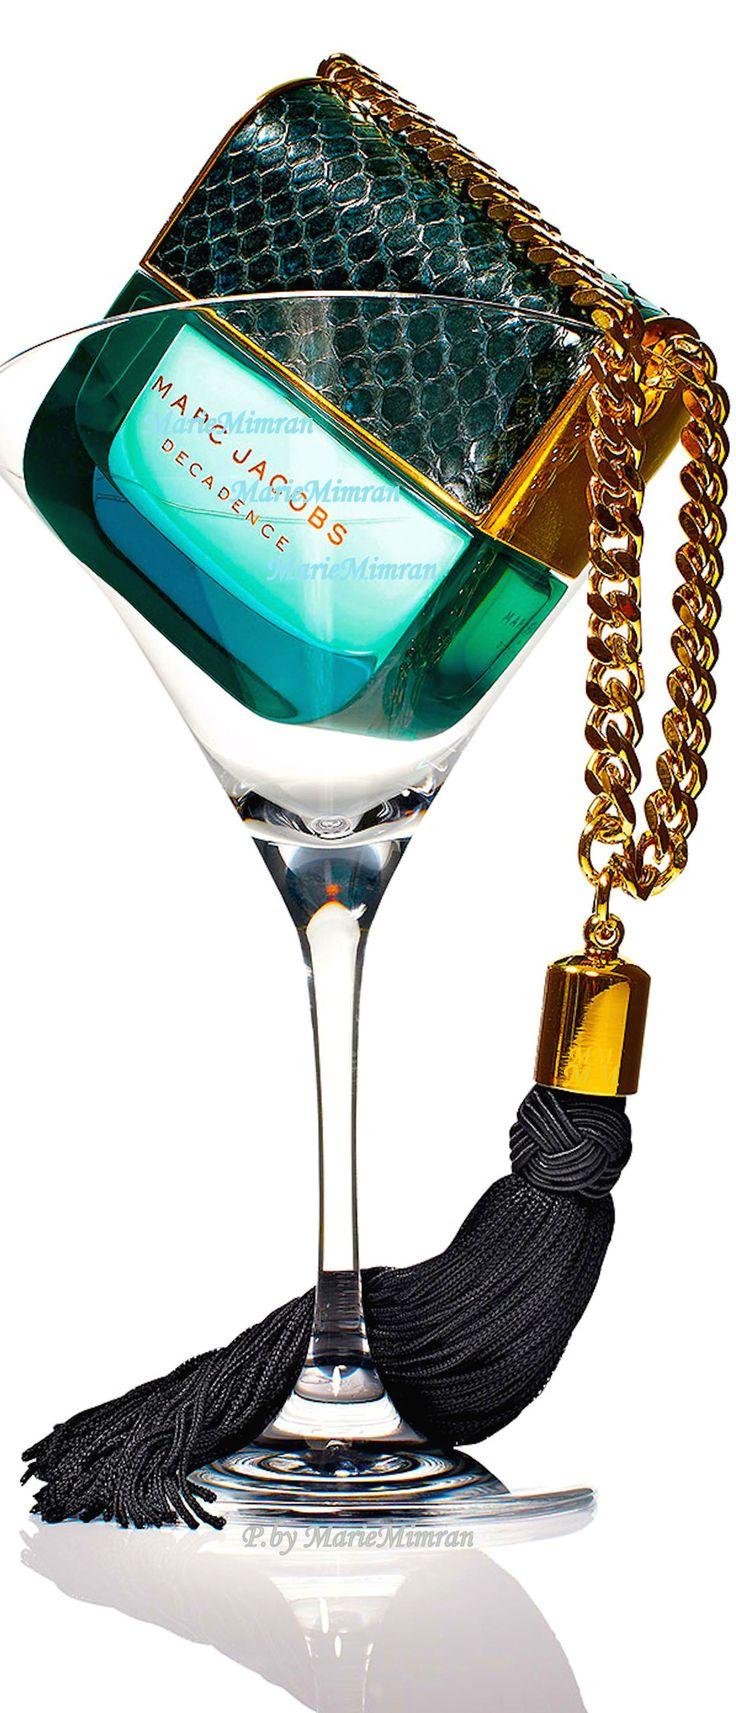 Marc Jacobs-Decadence Parfum-Marie Mimran